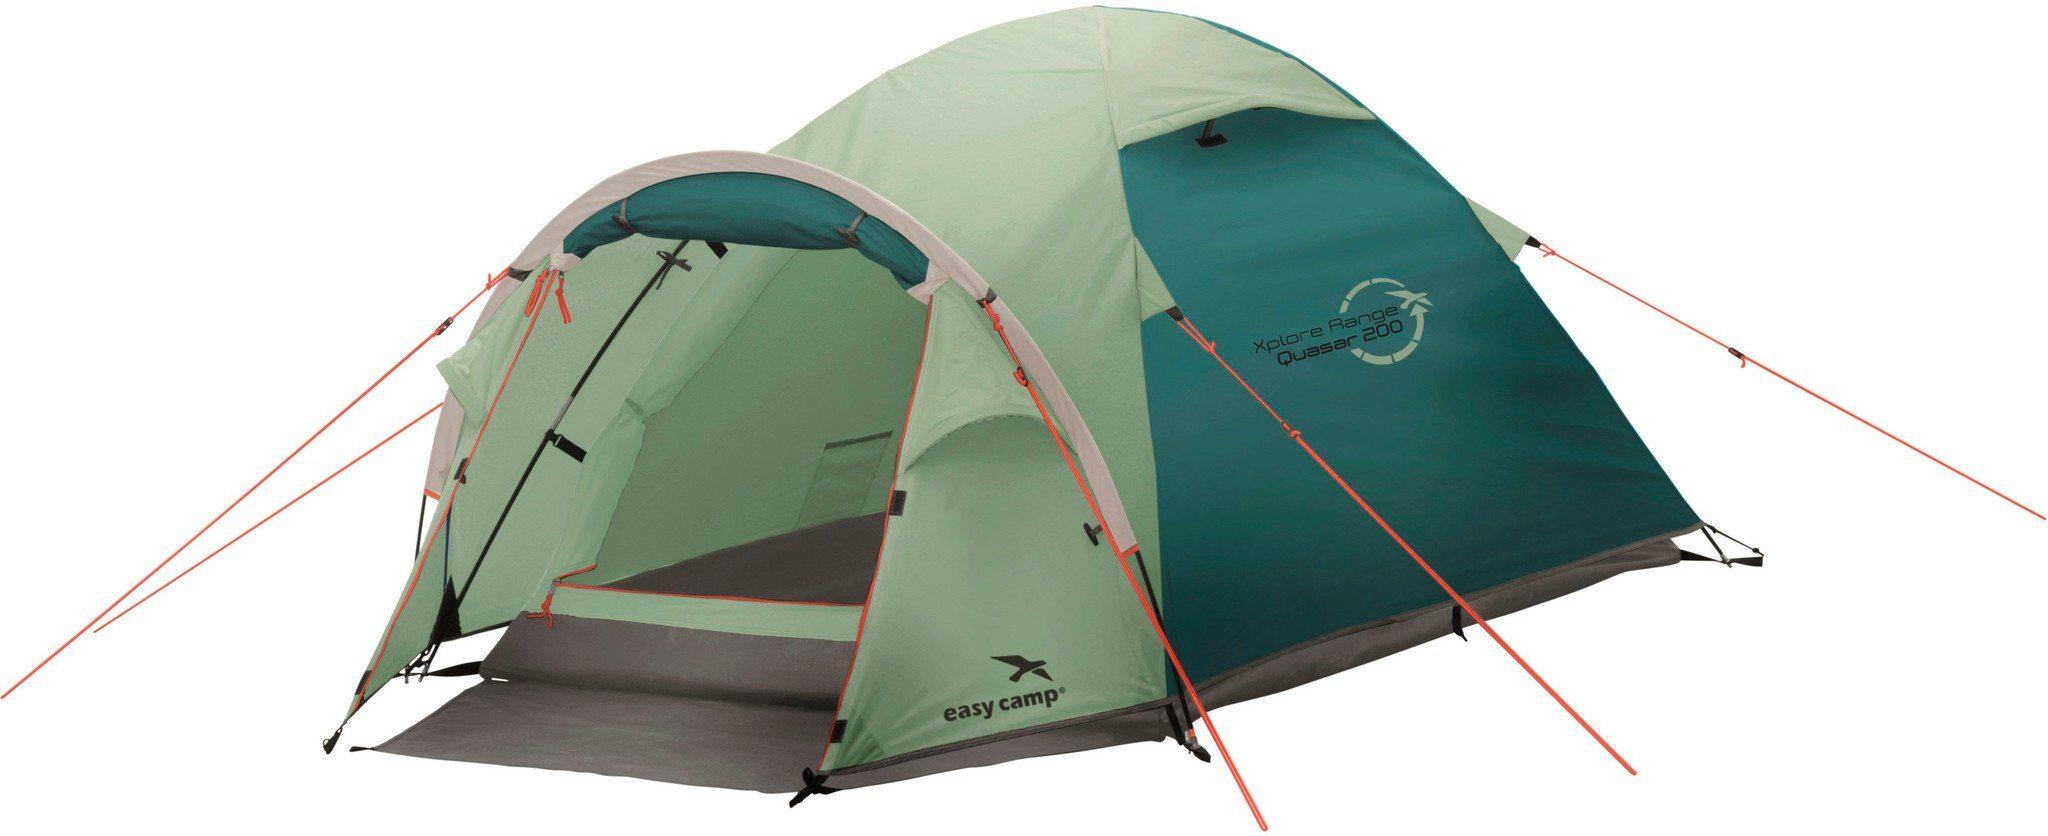 Easy Camp Zelt »Quasar 200 Tent«